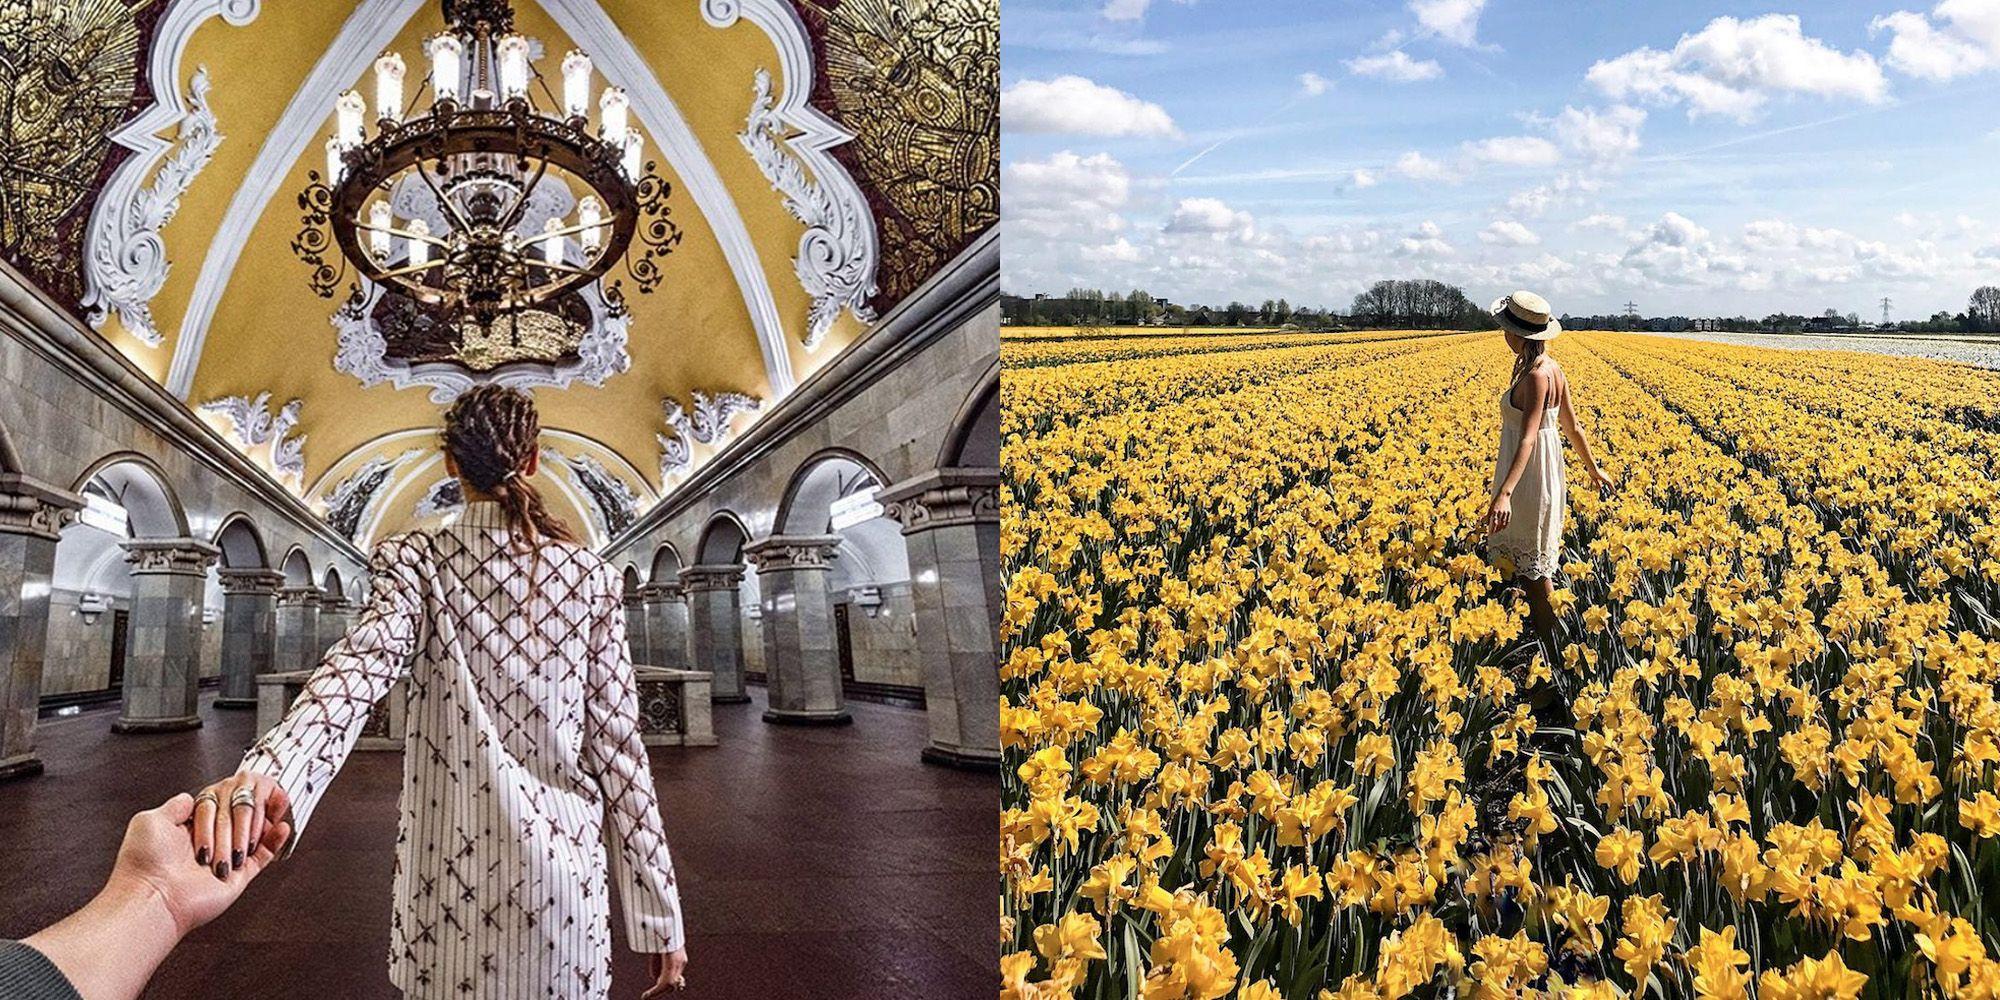 Ready, Set, Jet: 16 Travel Accounts to Follow on Instagram